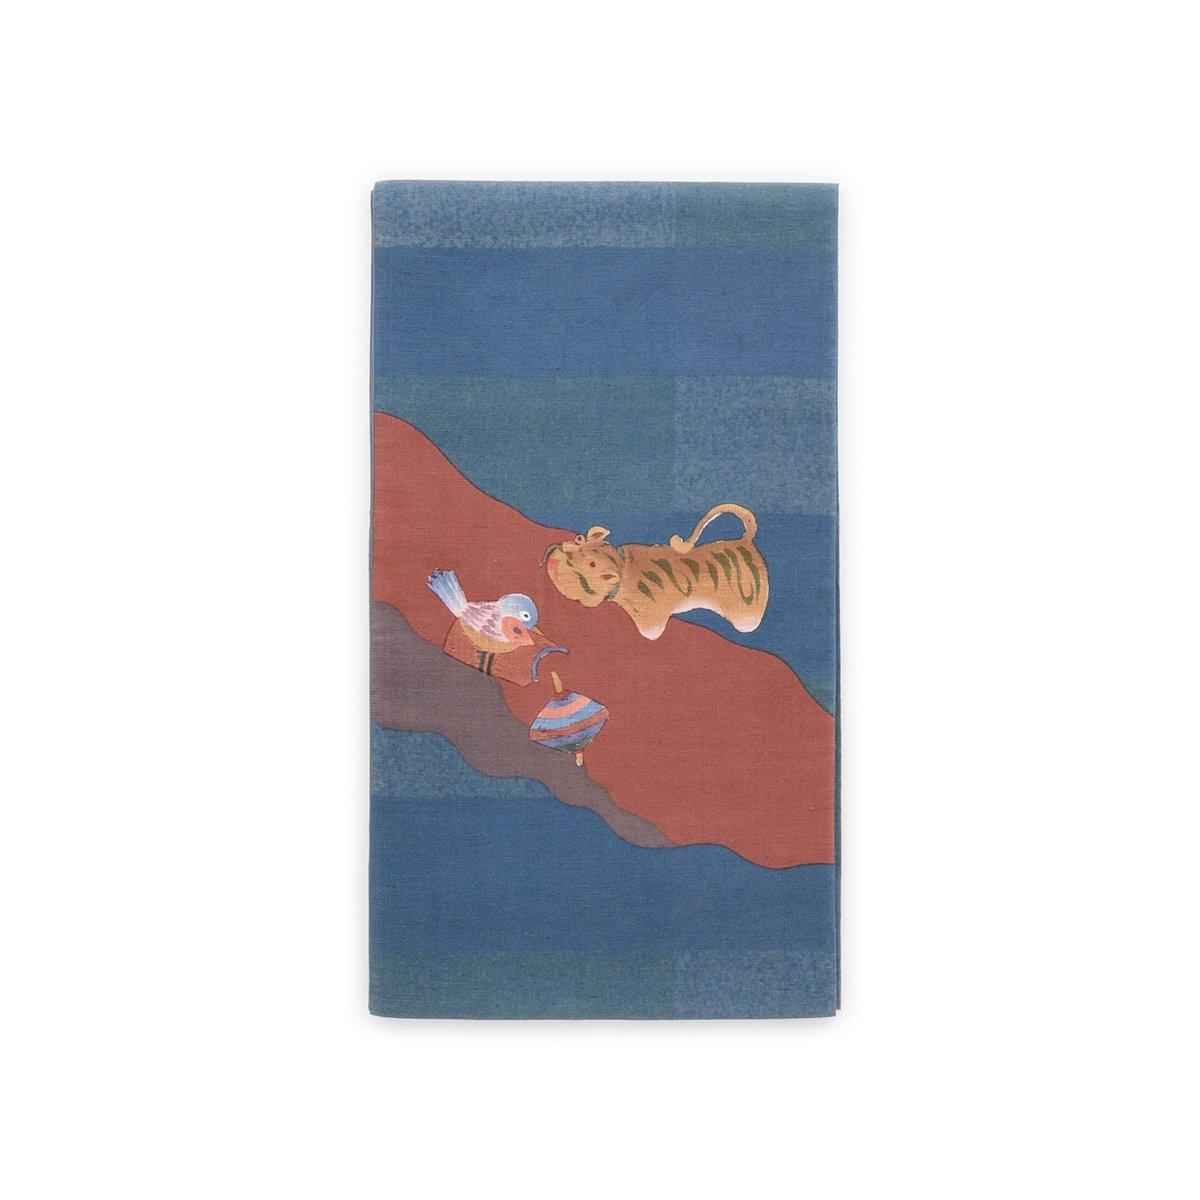 「洒落袋帯●郷土玩具」の商品画像